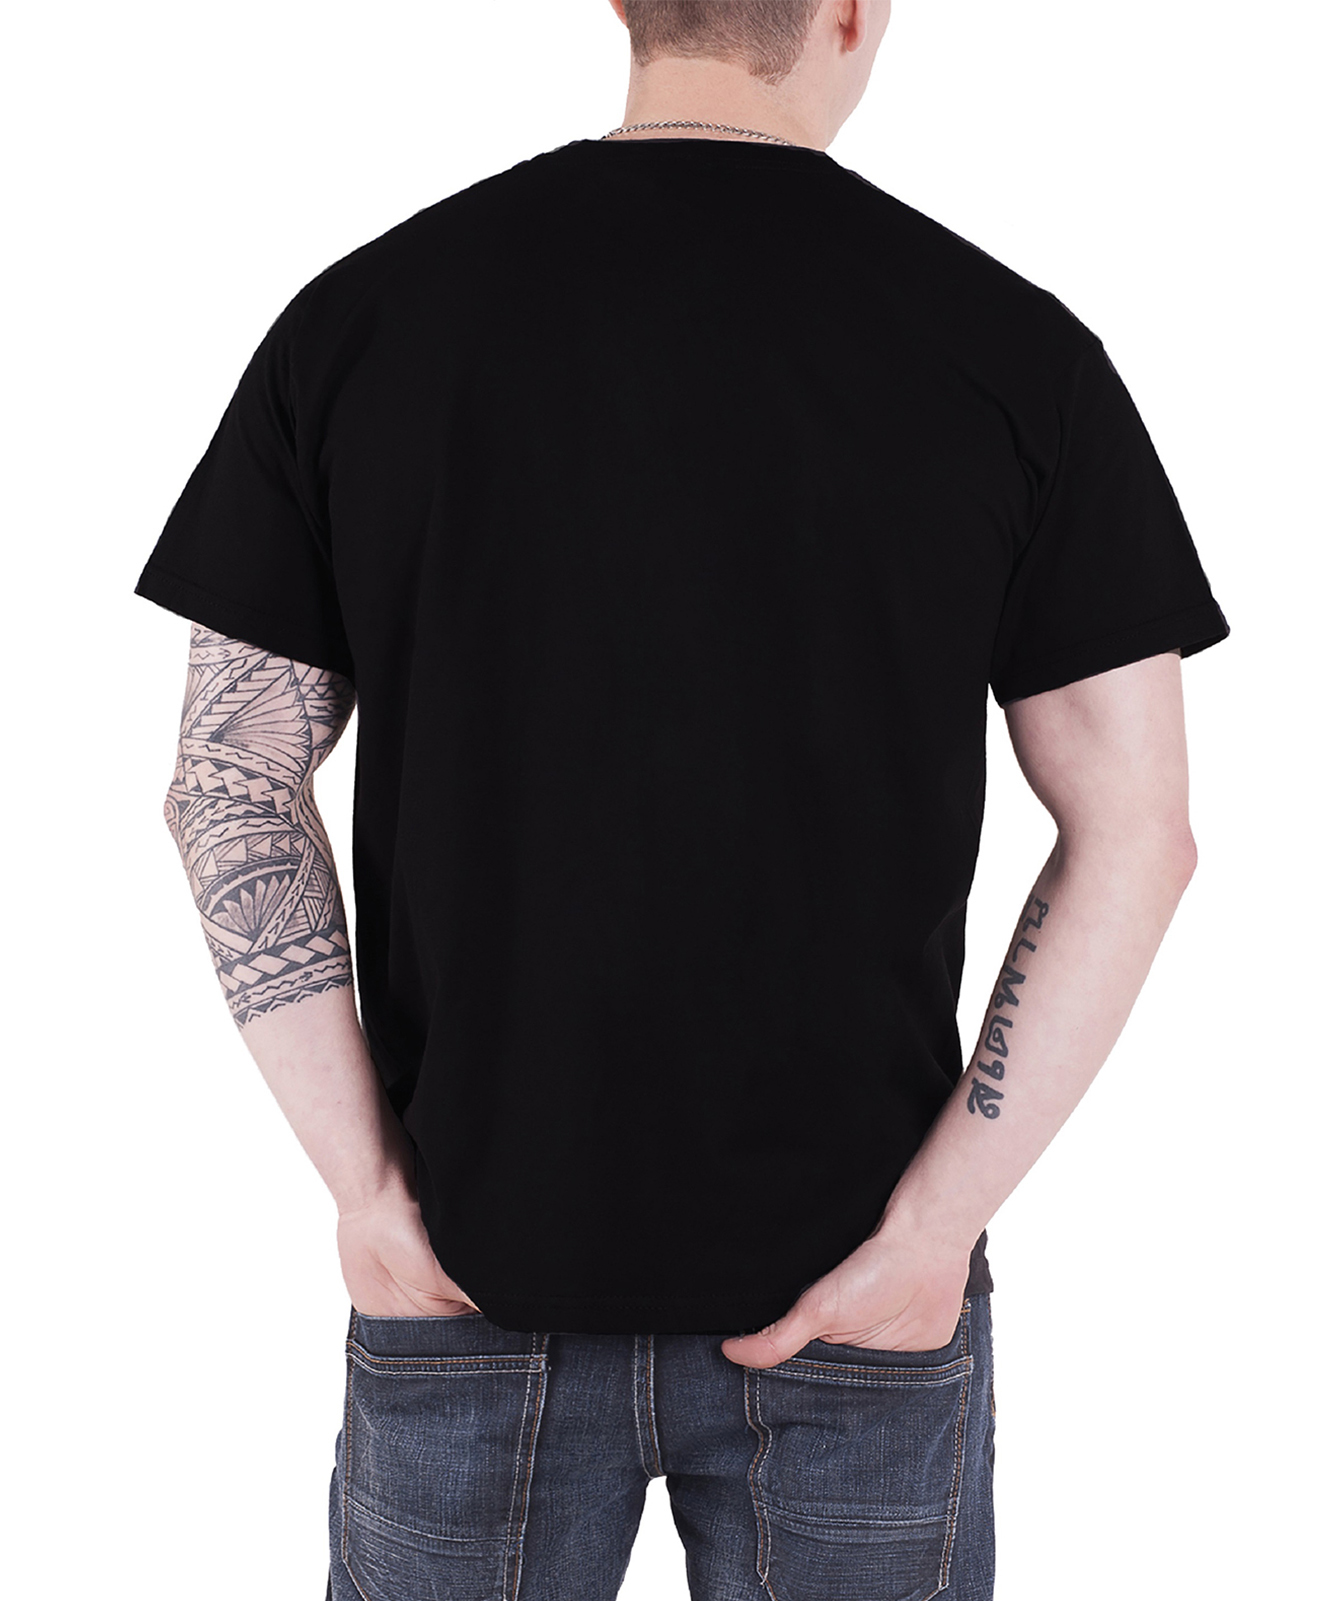 Official-Gas-Monkey-Garage-T-Shirt-Official-GMG-Logo-Kustom-Builds-new-Mens Indexbild 33